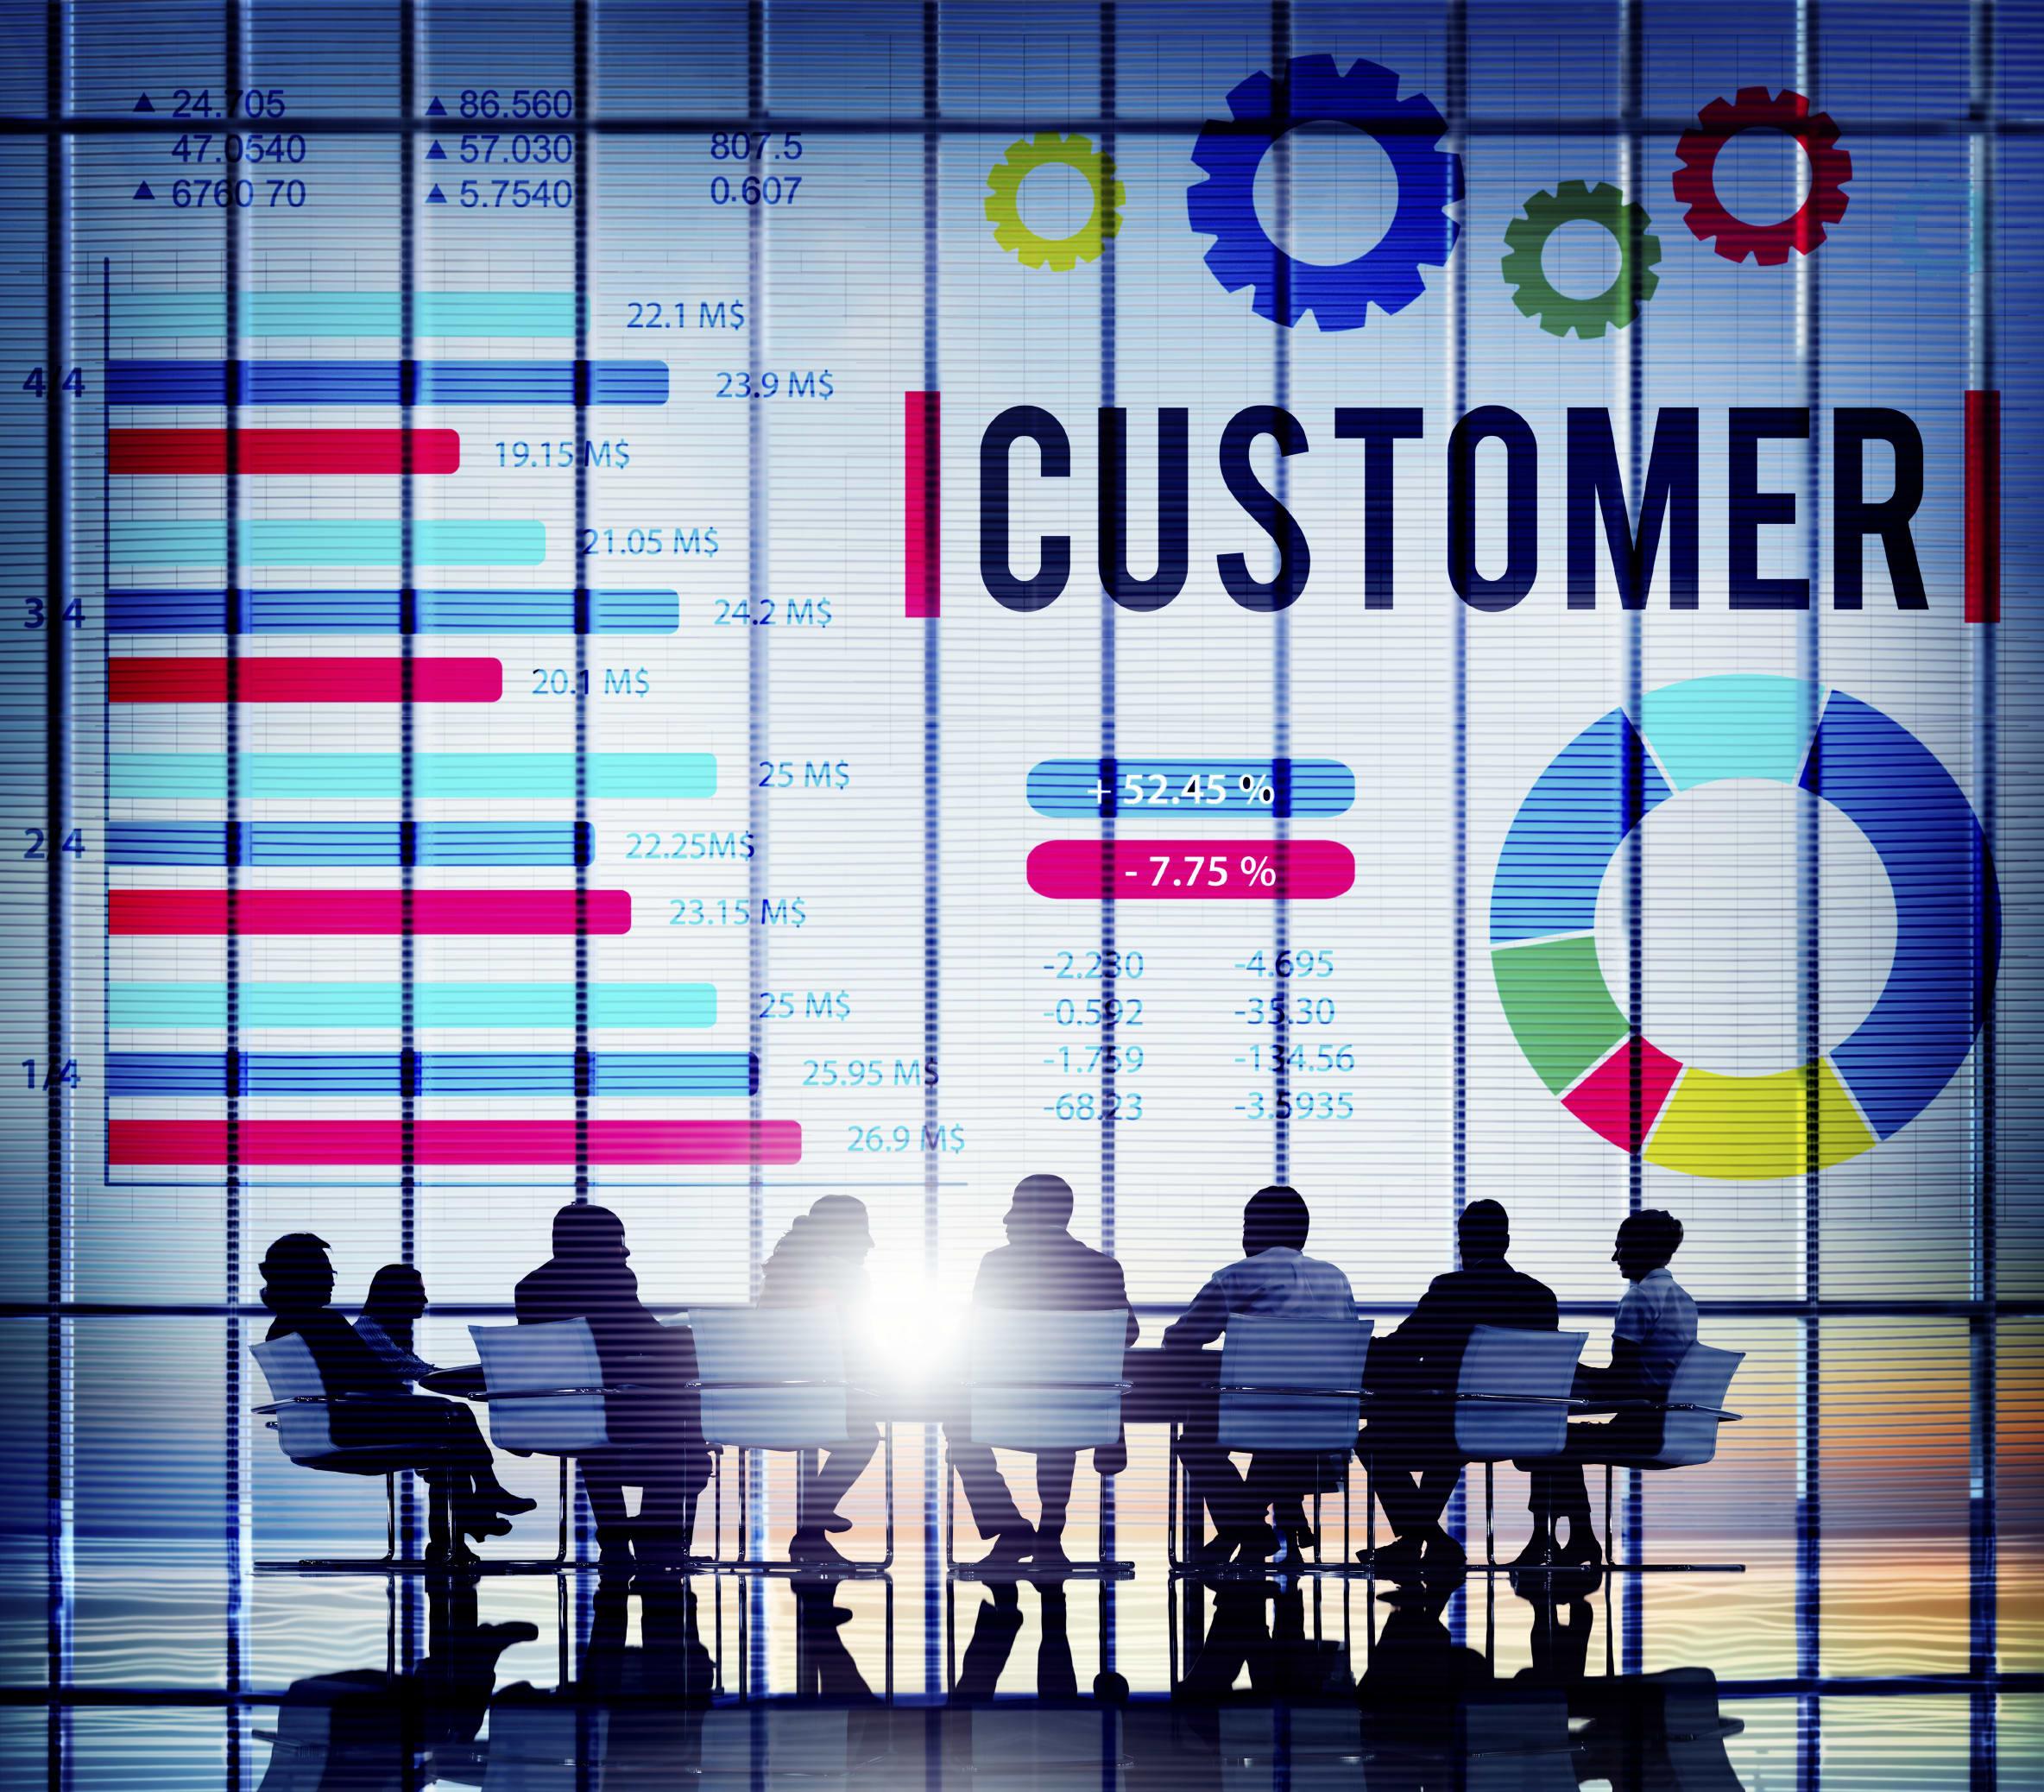 Customer Market Business Corporate Target Concept